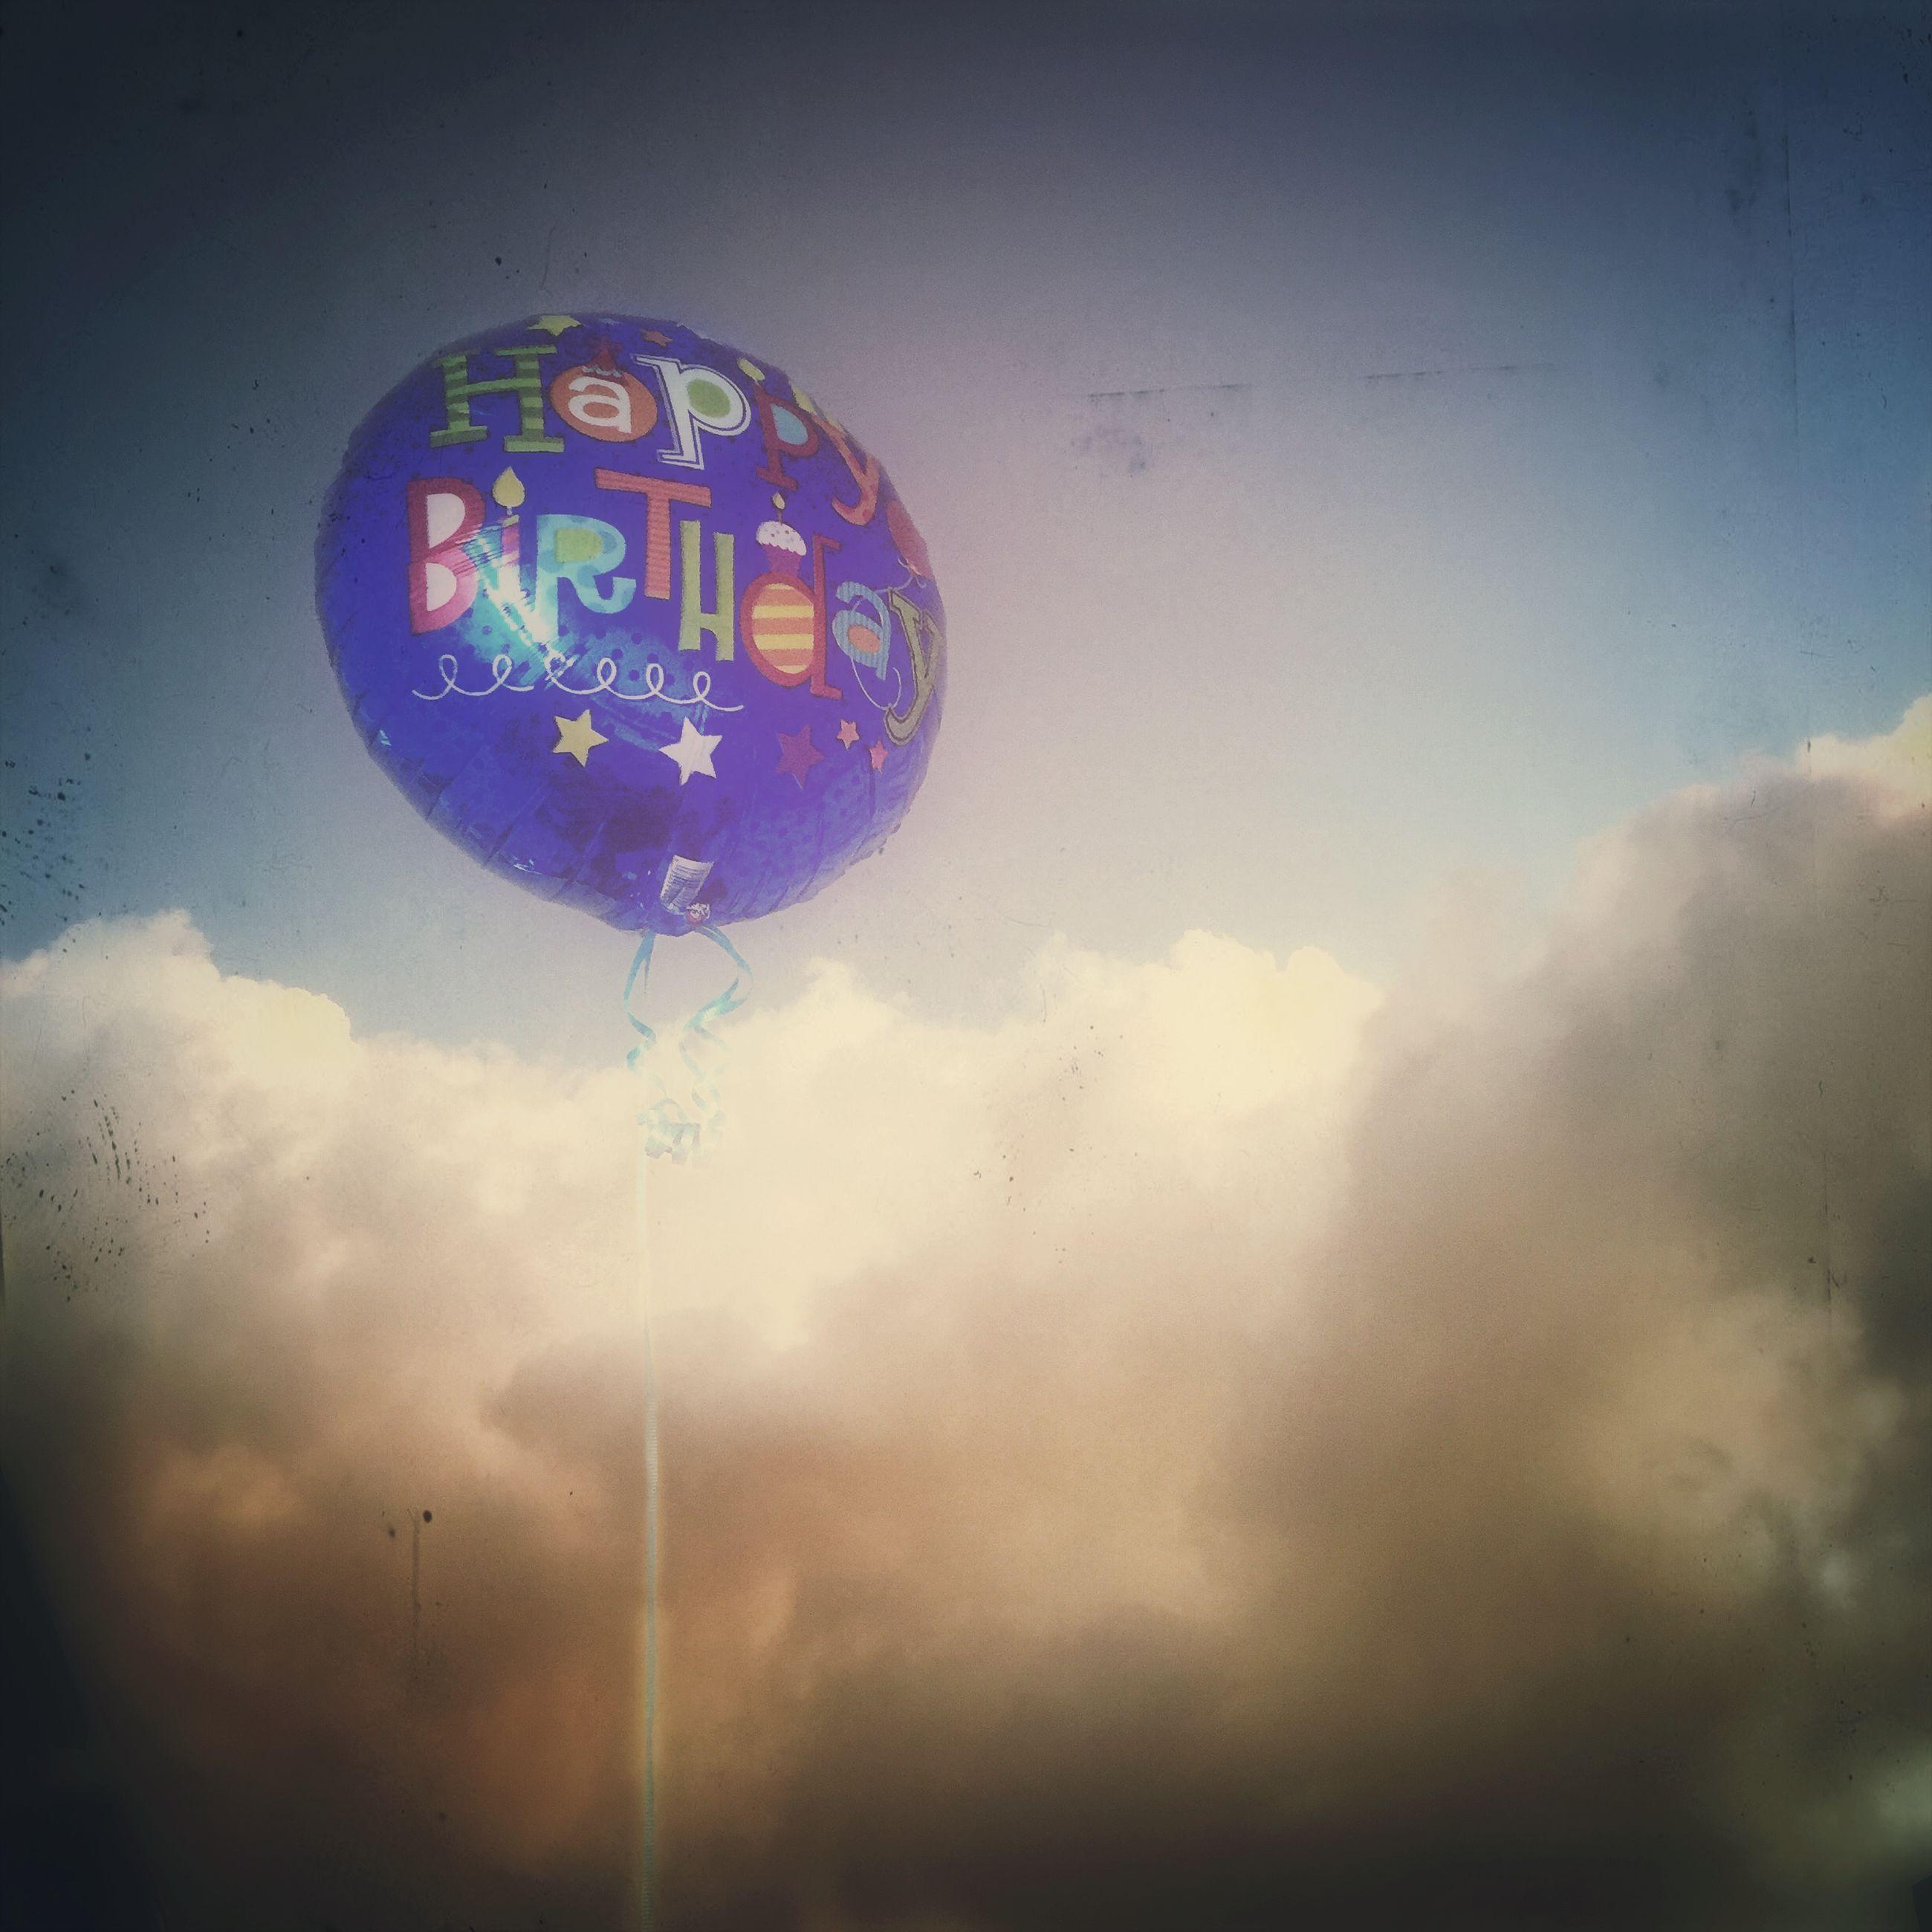 sky, low angle view, illuminated, lighting equipment, mid-air, sphere, cloud - sky, multi colored, street light, ferris wheel, dusk, blue, outdoors, flying, transportation, no people, amusement park, circle, amusement park ride, night